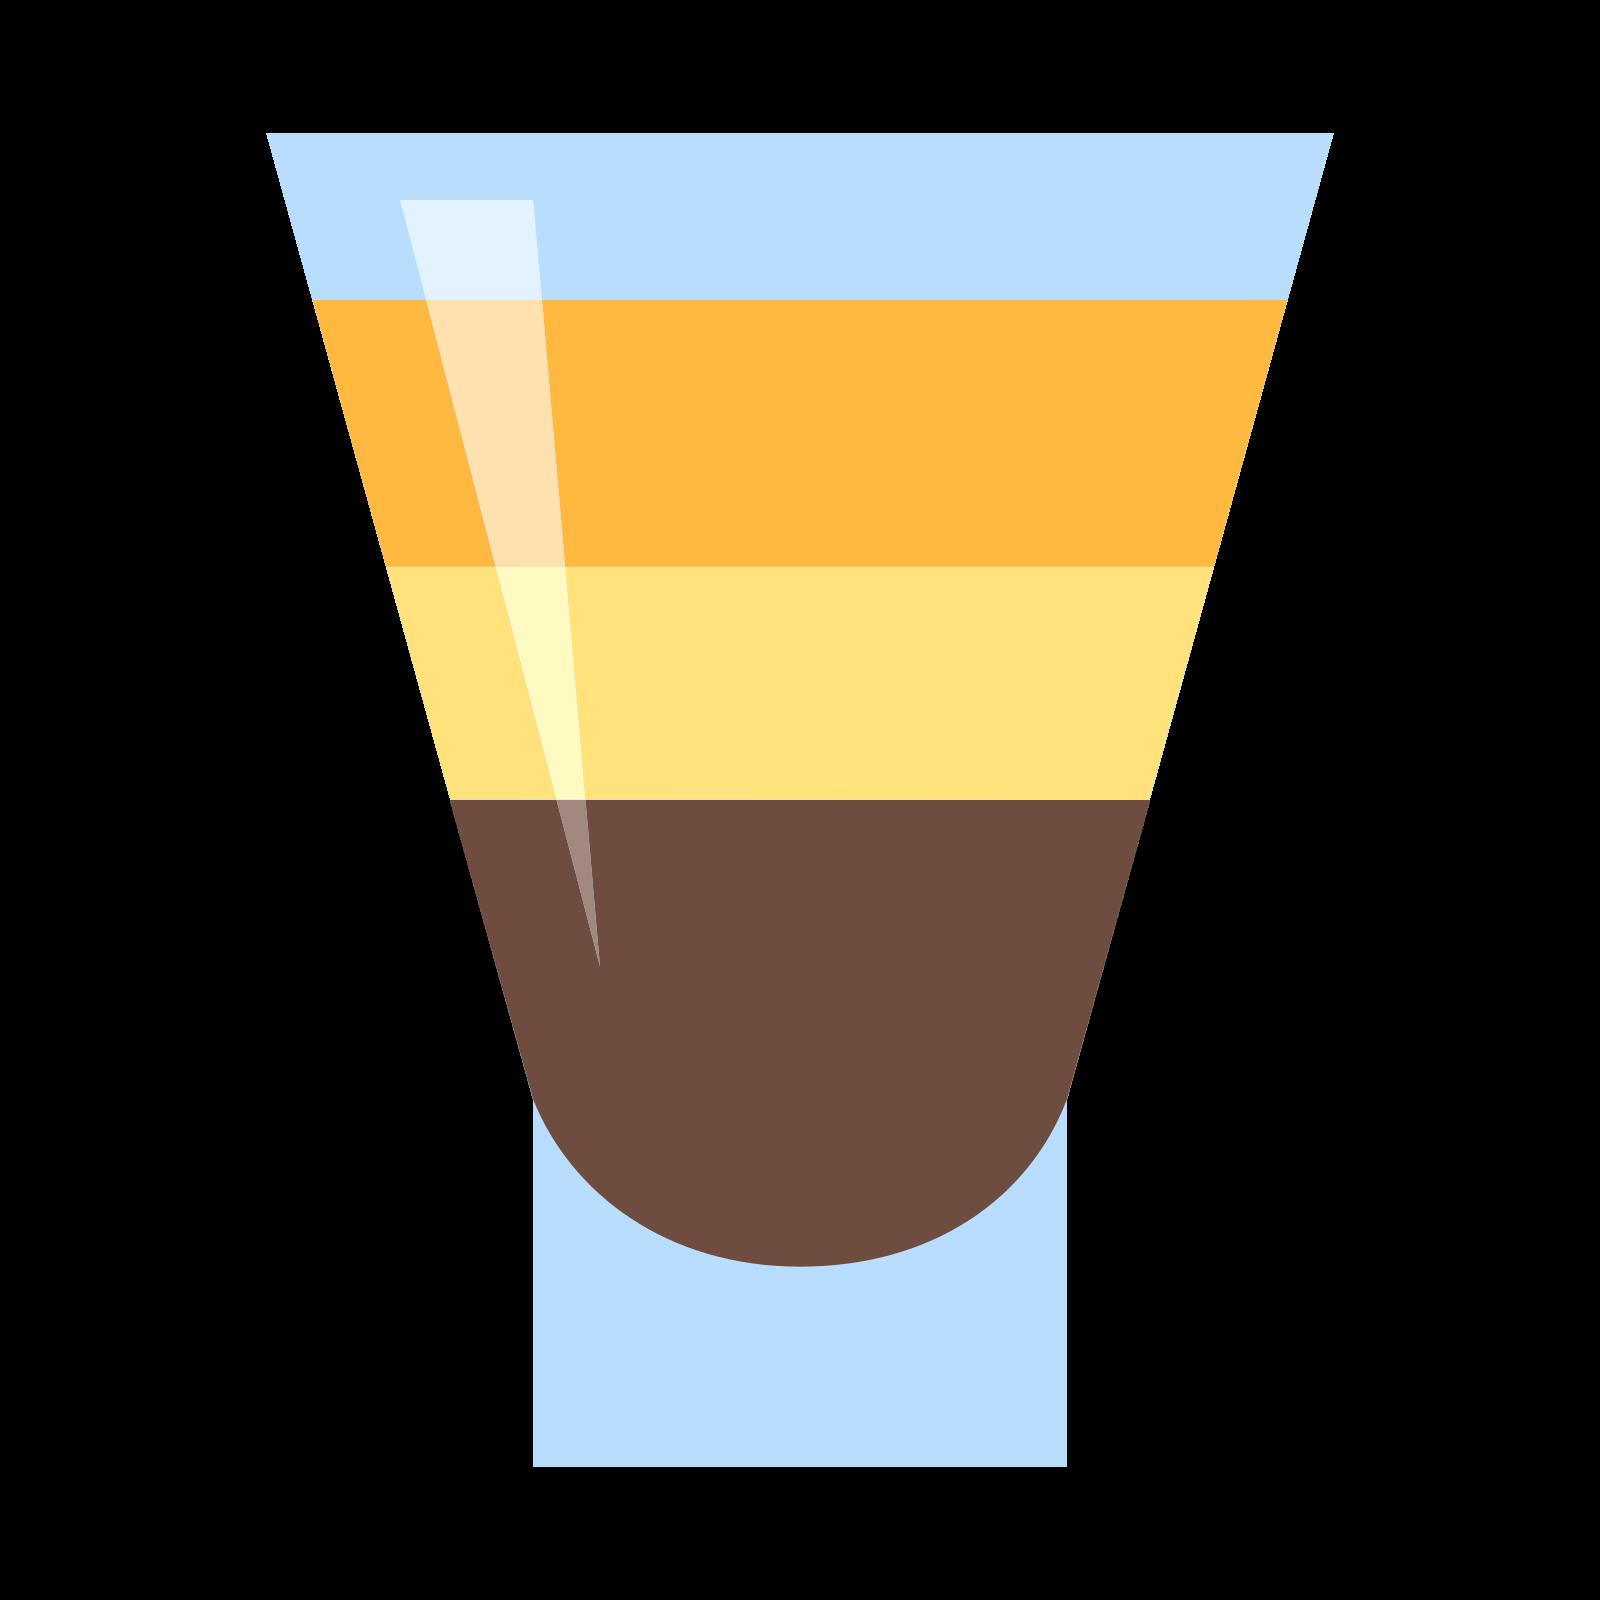 Coctail Shot icon